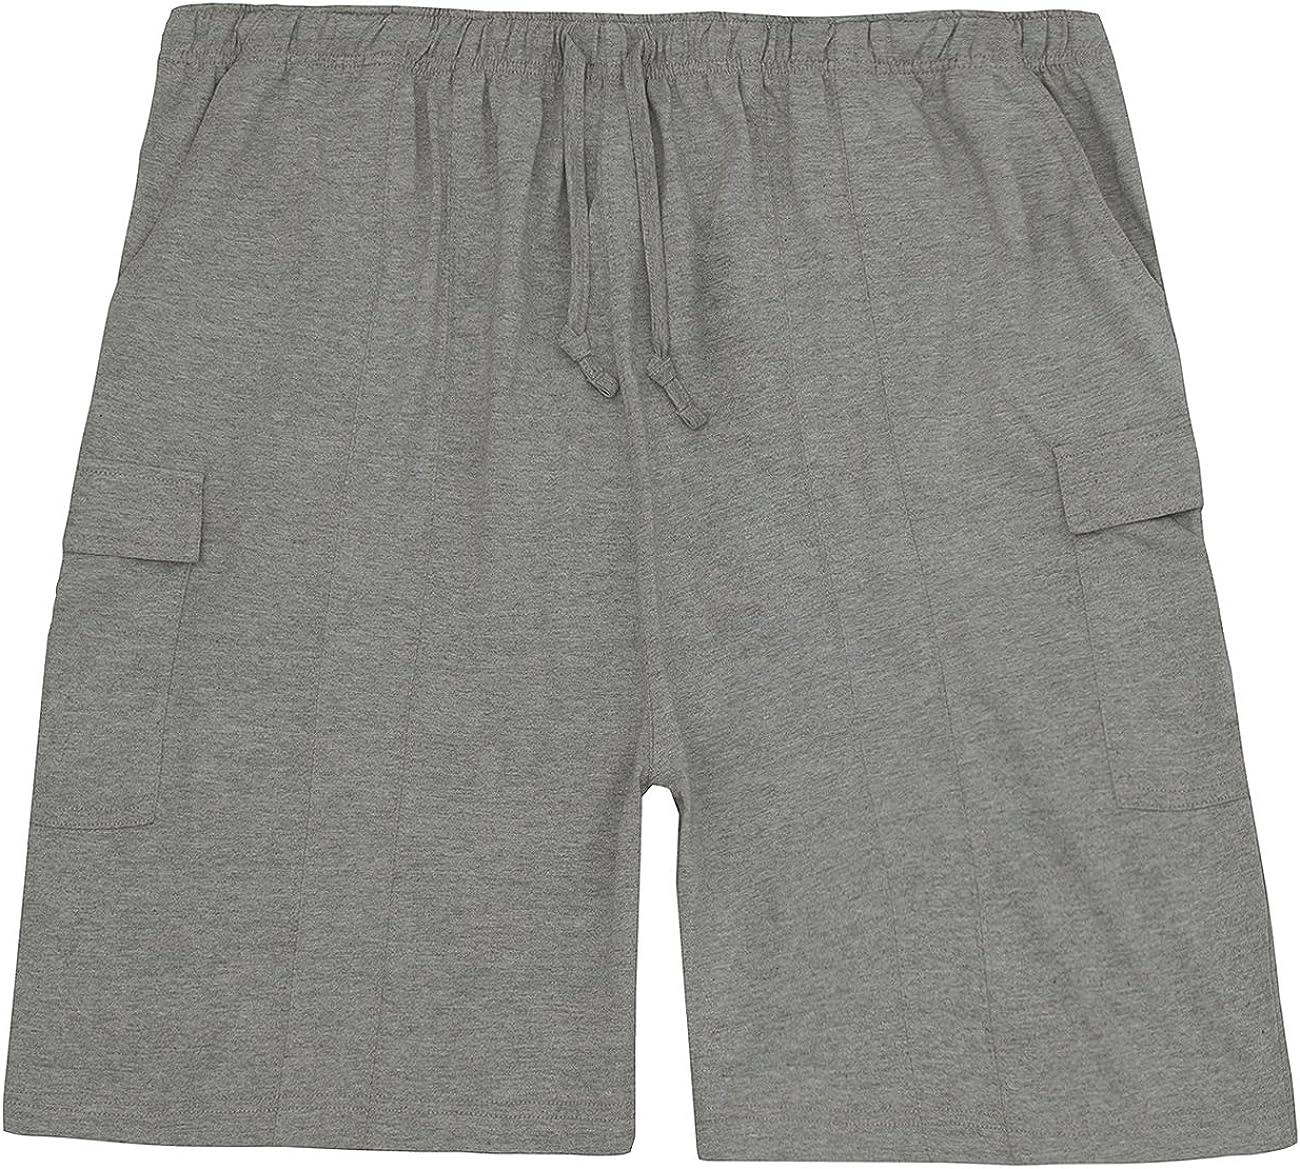 Sizes 3XL - 5XL Magneto Mens Jersey Shorts Elasticated Waist